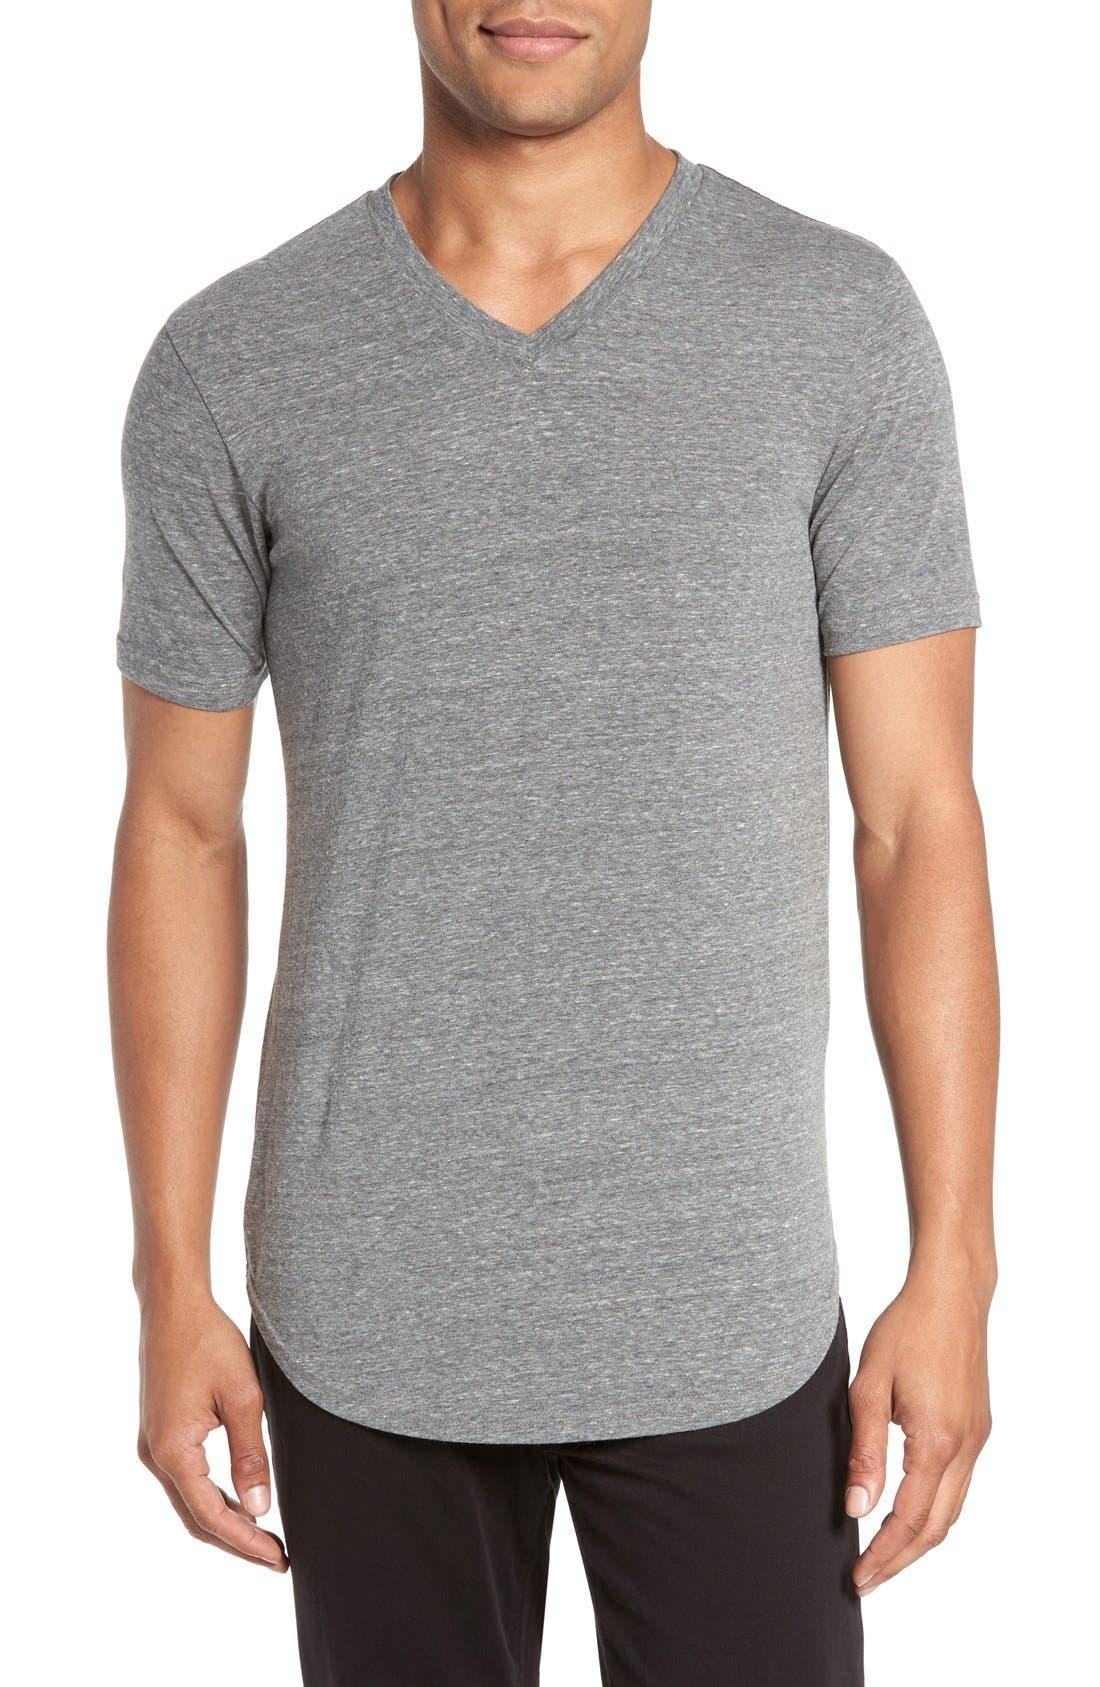 Main Image - Goodlife Scalloped Hem V-Neck T-Shirt